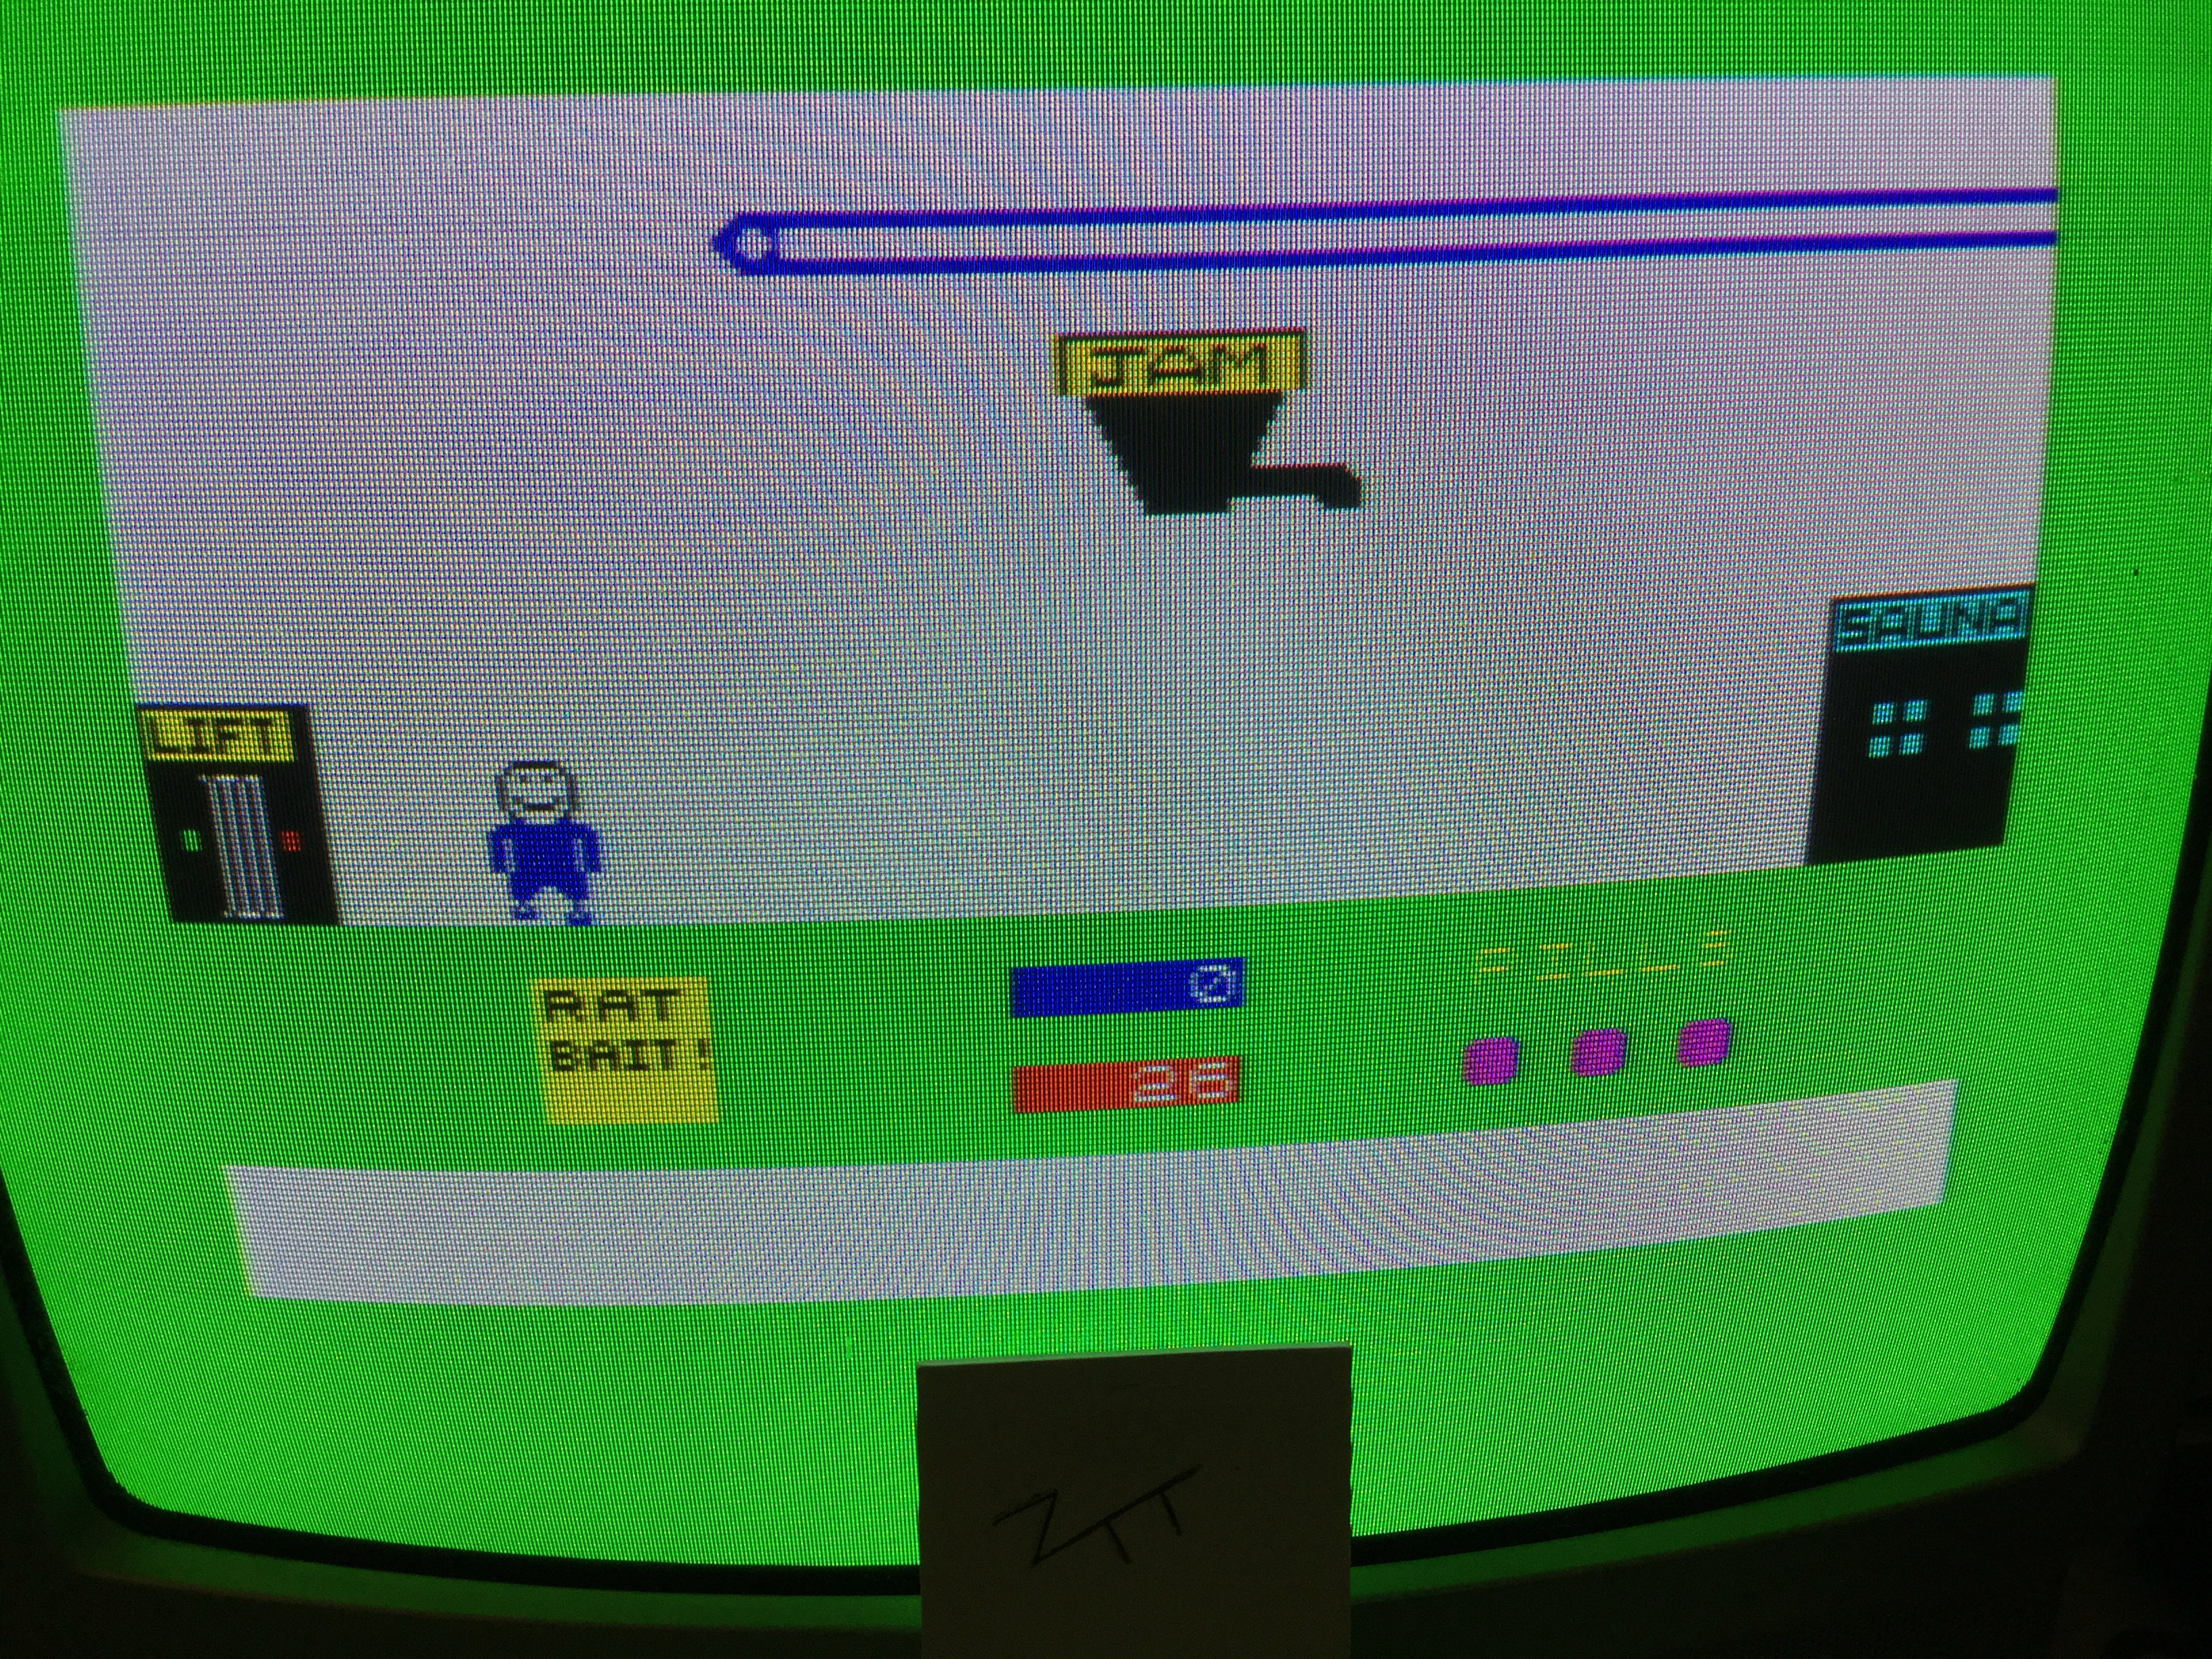 Frankie: Apple Jam (ZX Spectrum) 26 points on 2017-06-24 02:55:52